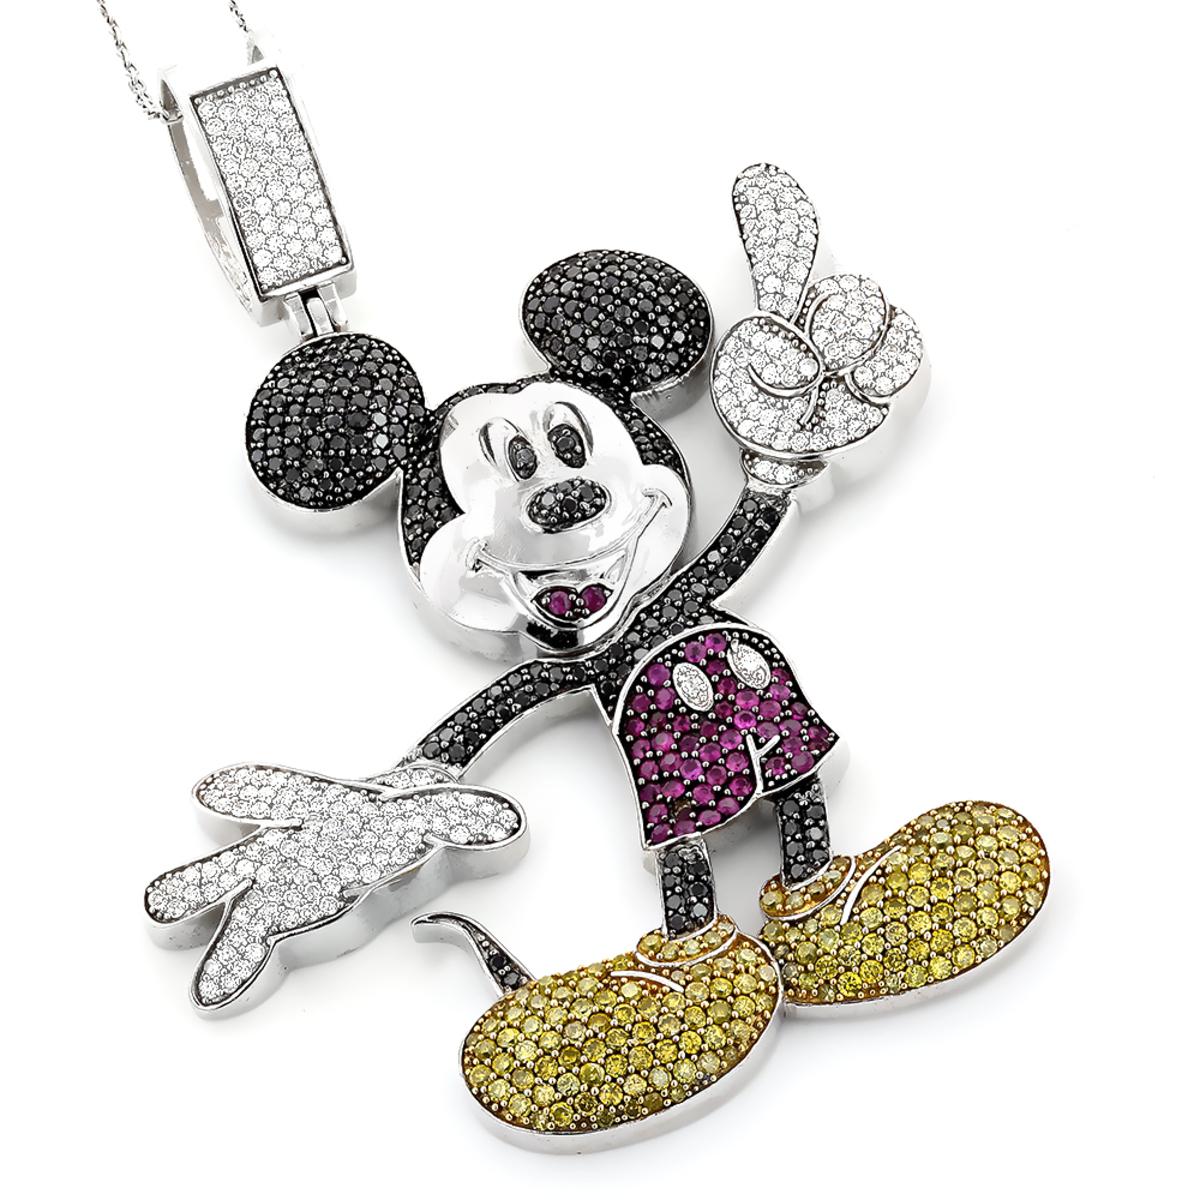 10K Gold Color Diamond Mickey Mouse Pendant 5.22ct